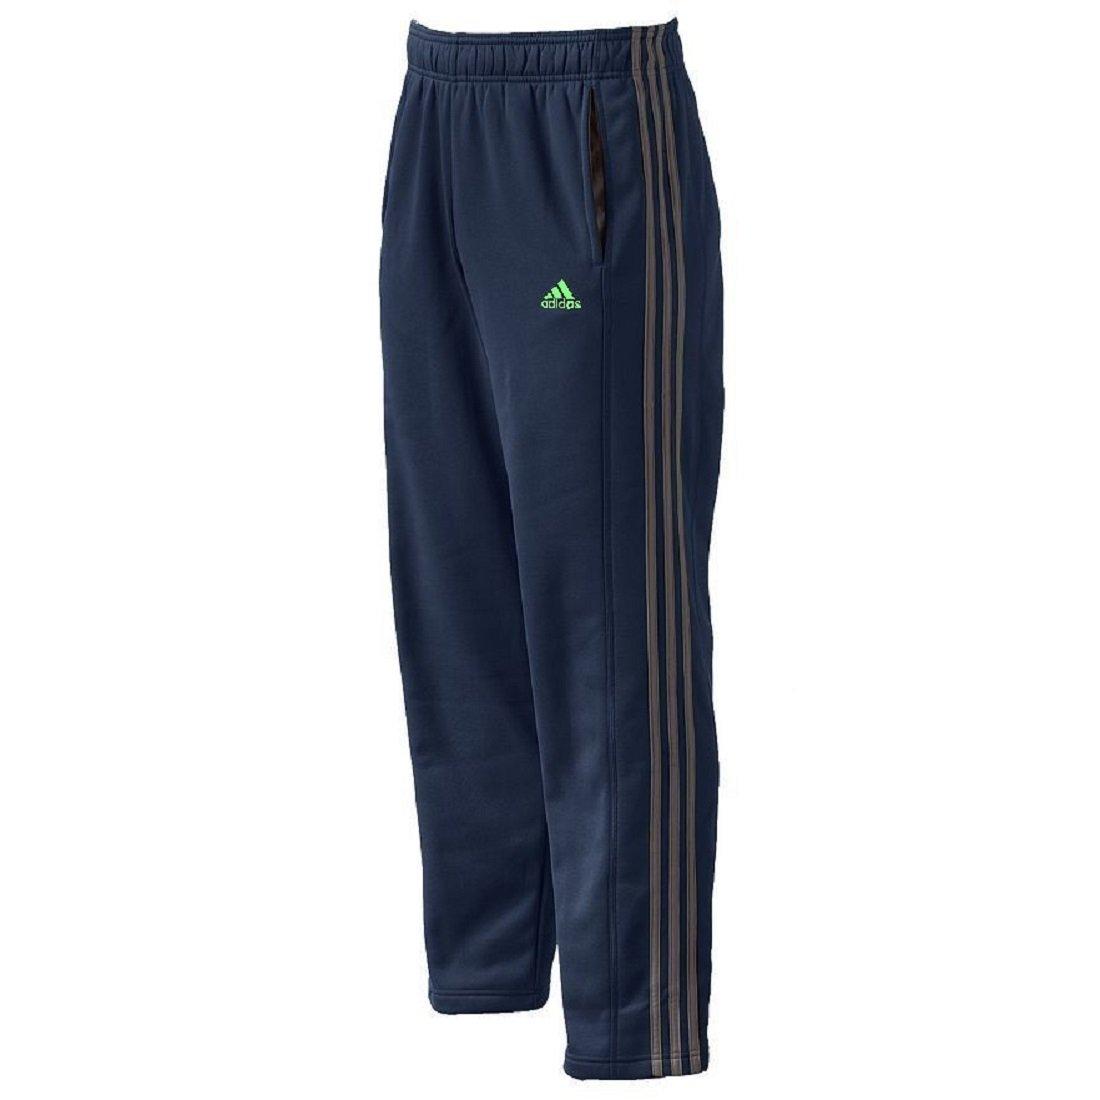 515eaf201571 Amazon.com  adidas Boys 8-20 Fleece Route Pants